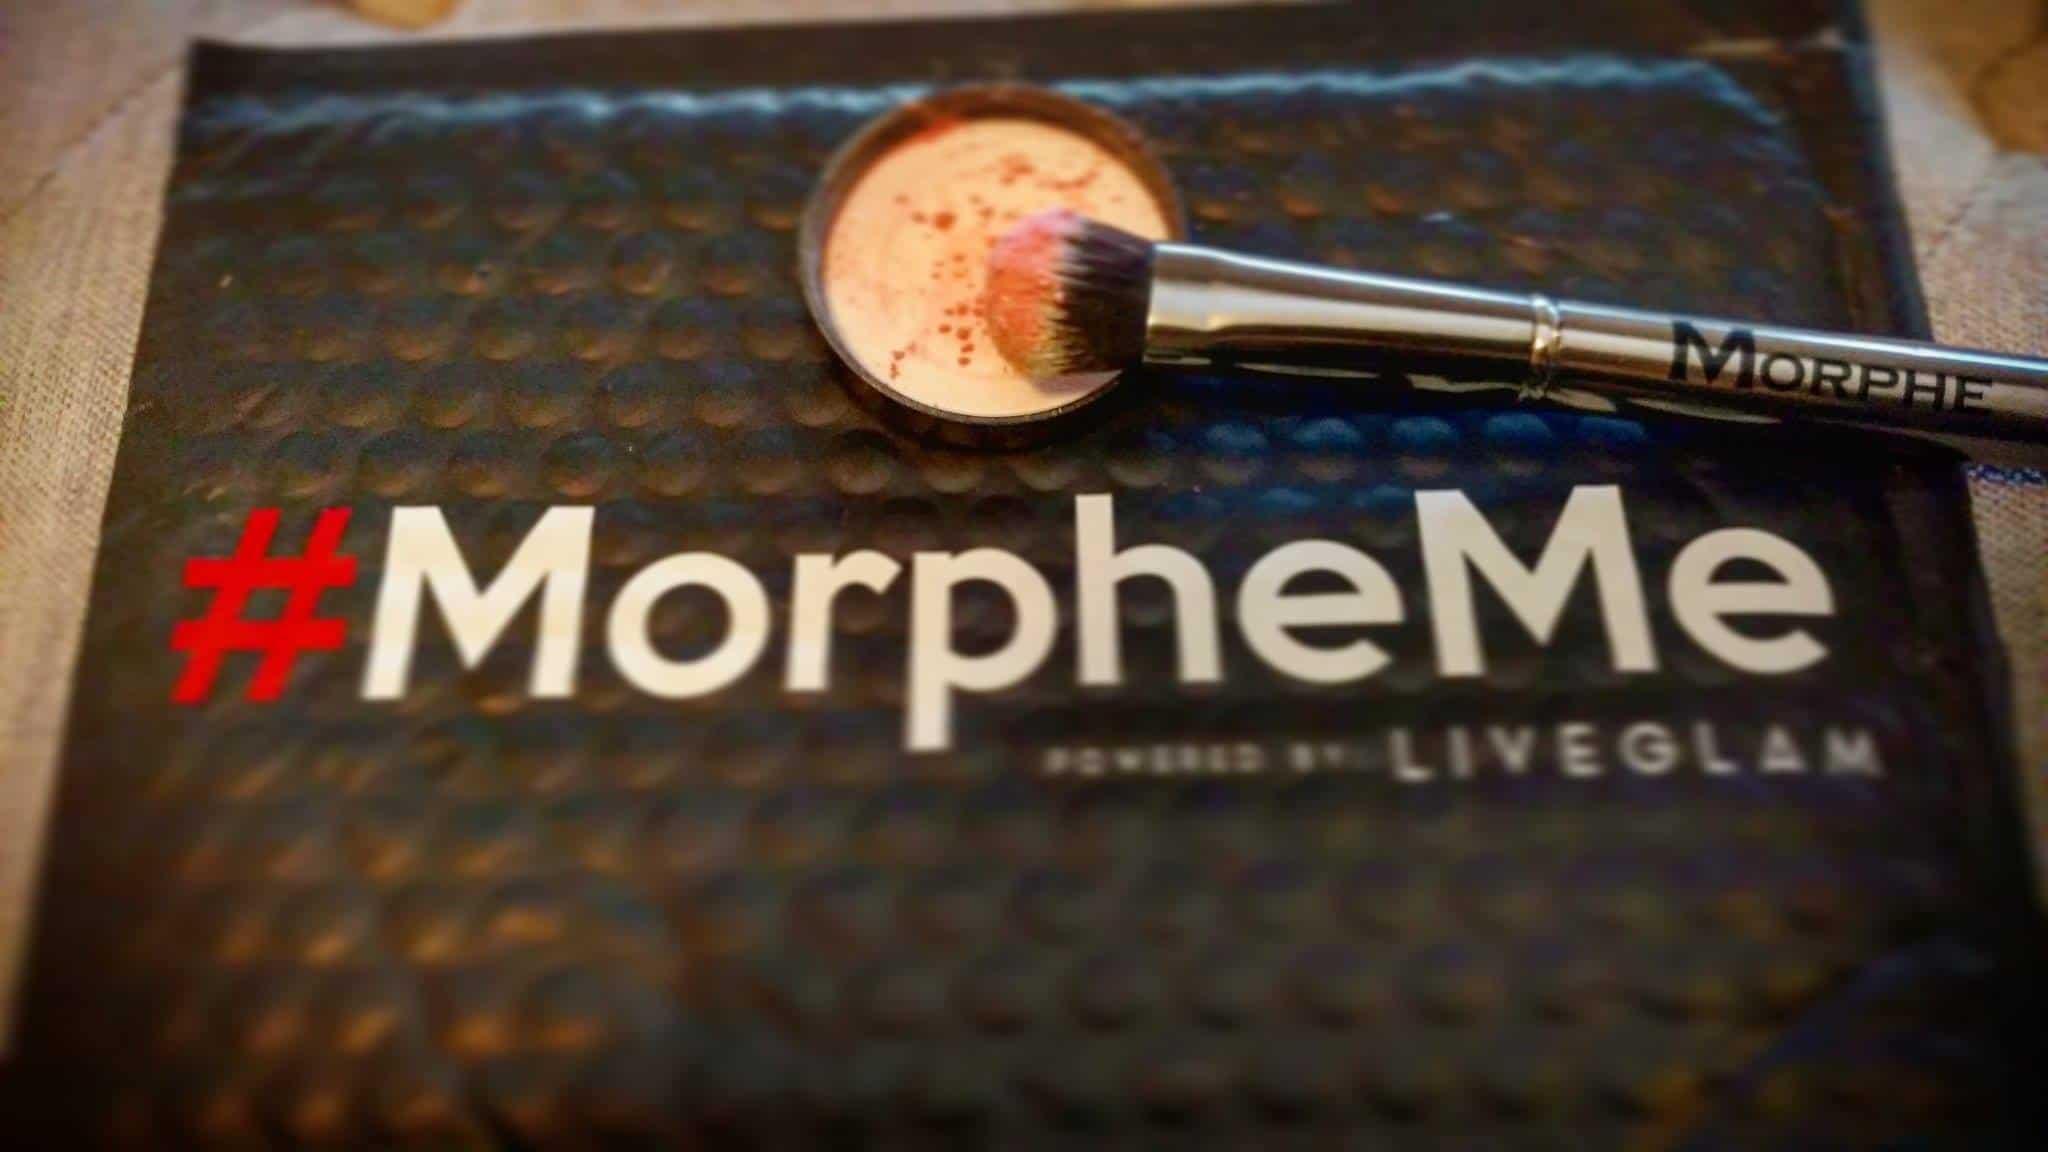 February 2017 LiveGlam MorpheMe Brush Club